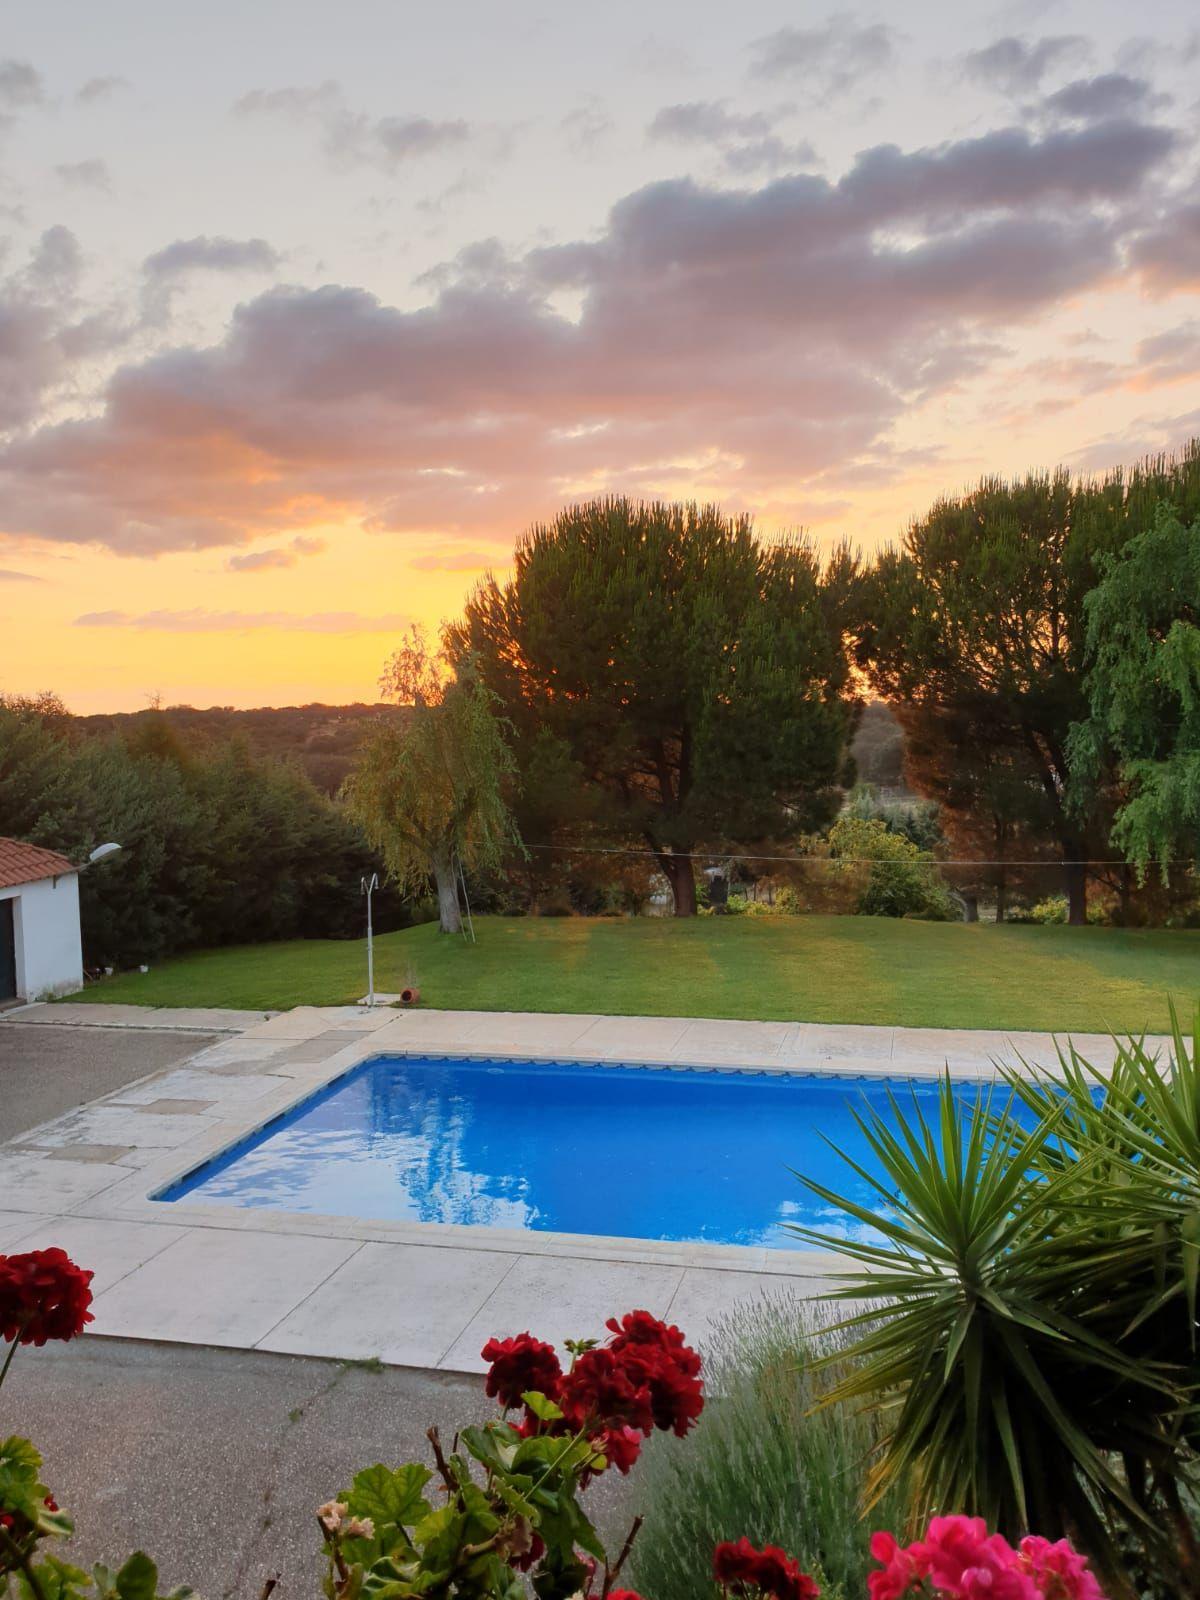 Alquiler de casa con piscina para reuniones o celebraciones